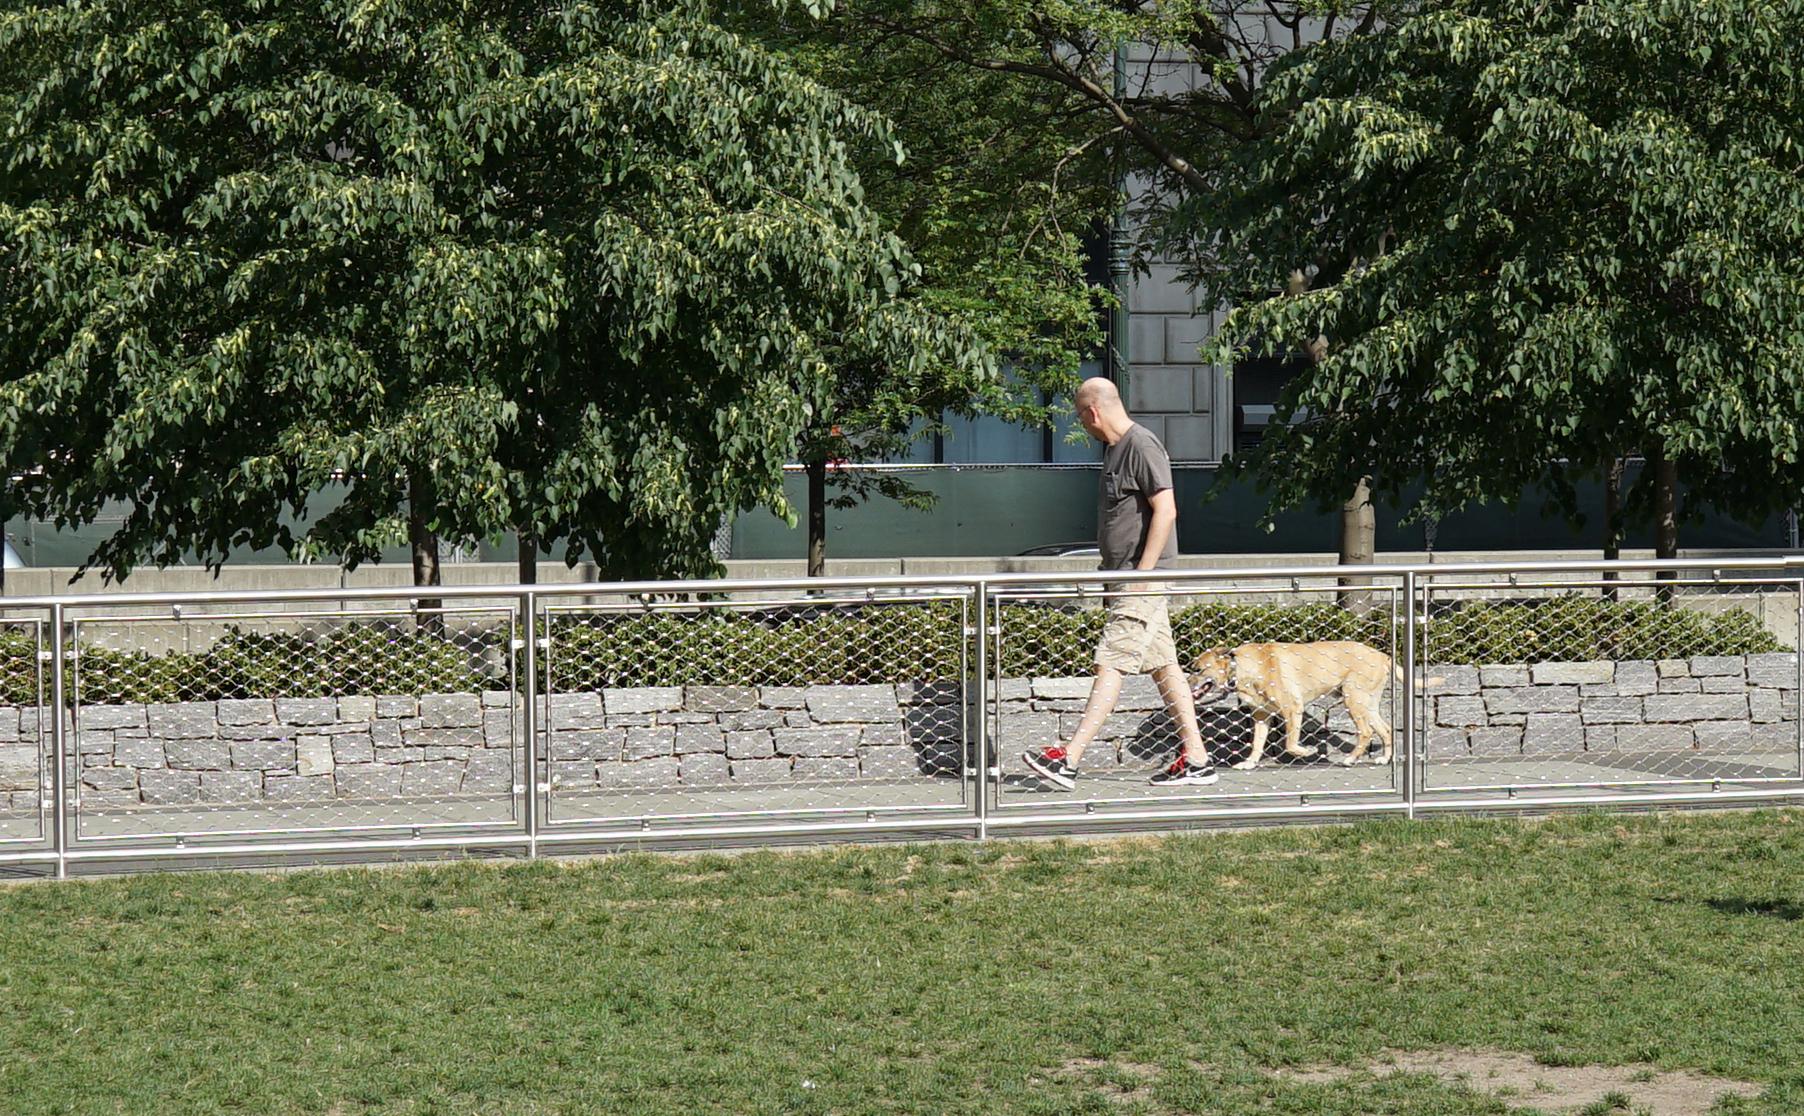 Dog on walkway by grass field